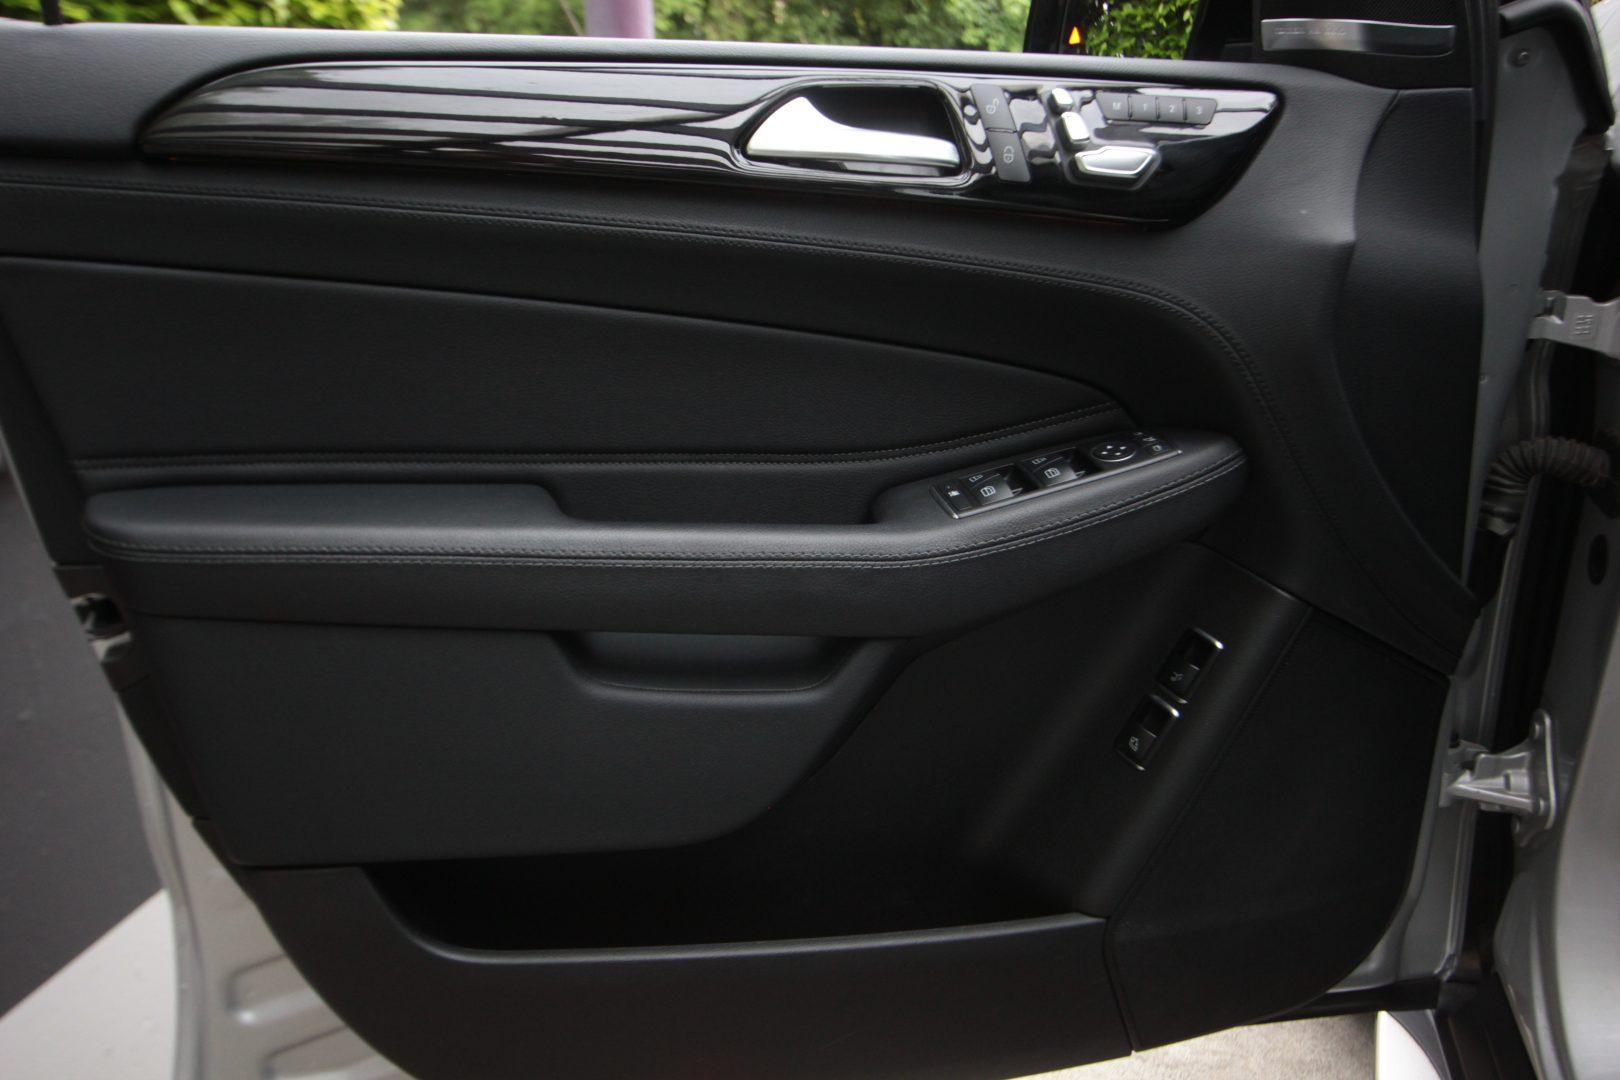 AIL Mercedes-Benz GLE 450 AMG 4Matic 11